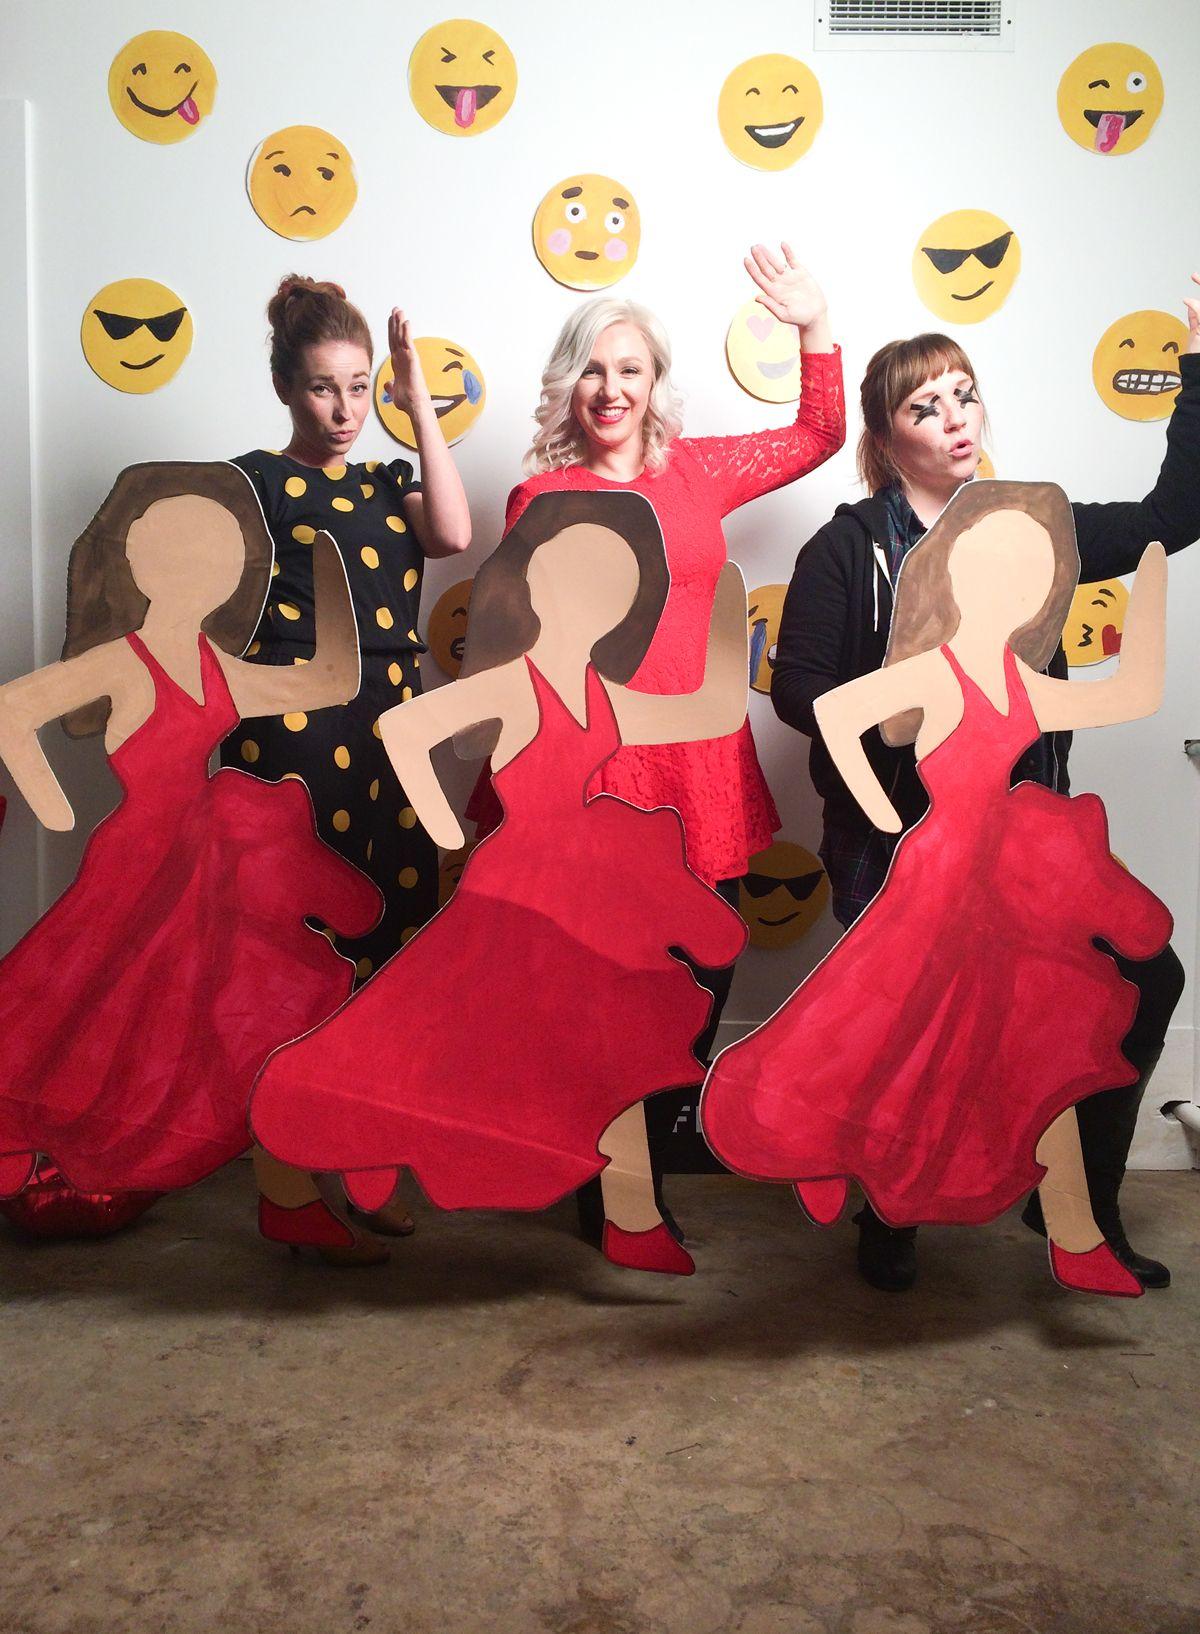 Red dress dancing emoji edits